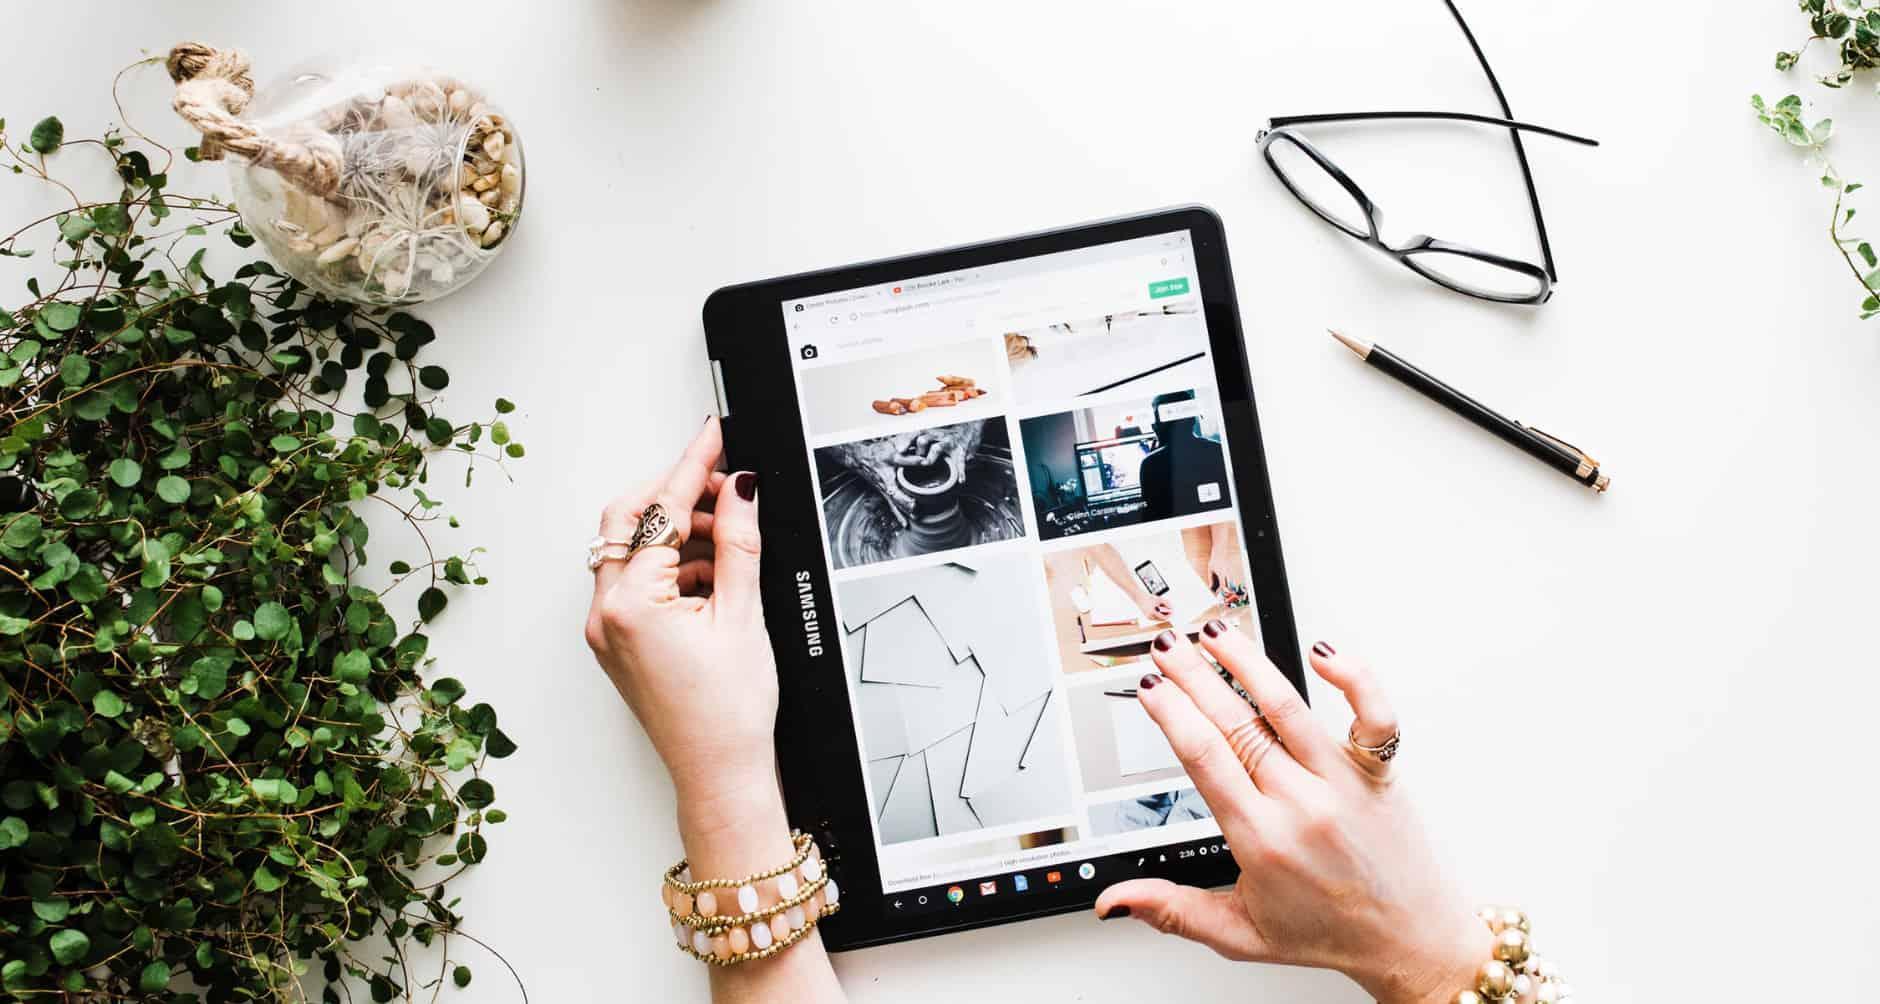 Best Shopify Alternative: Our #1 Picks For E-Commerce Newbies